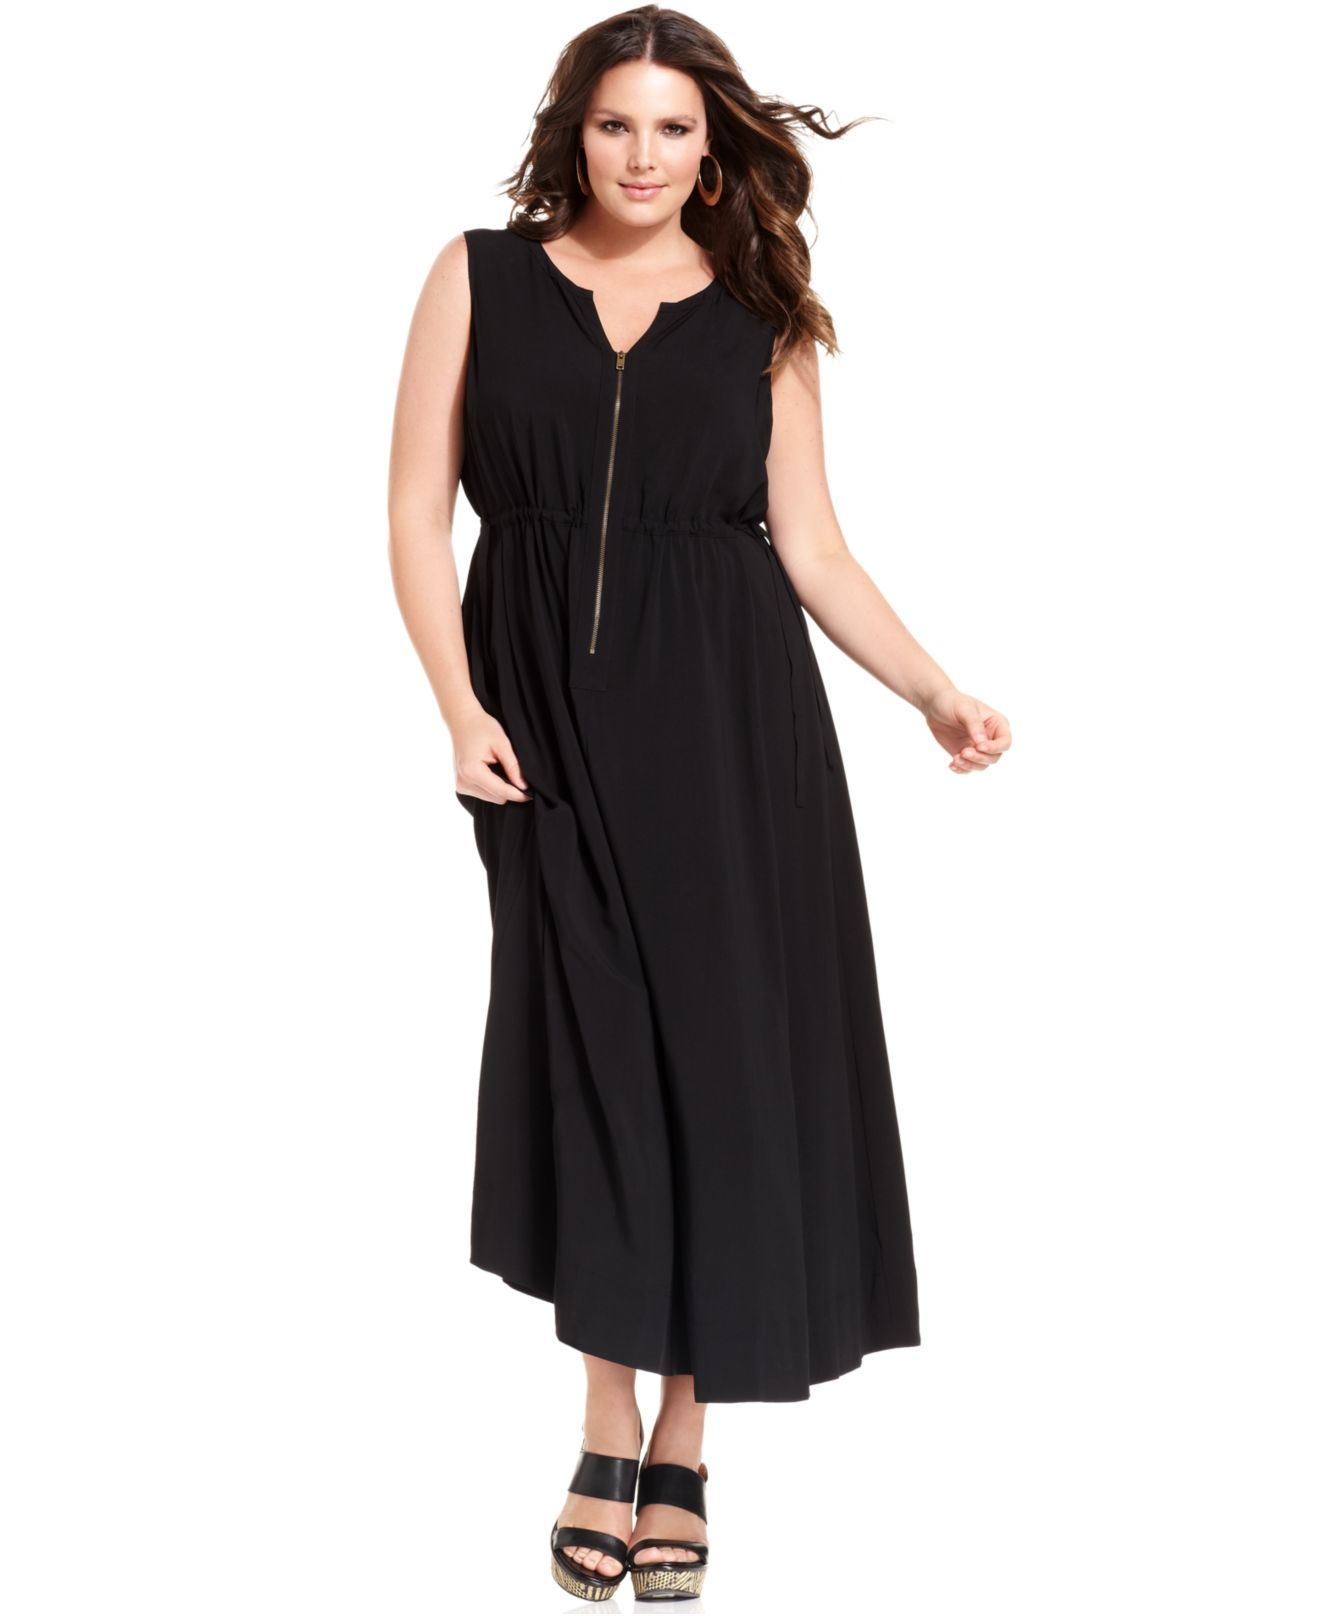 Dknyc plus size maxi dresses